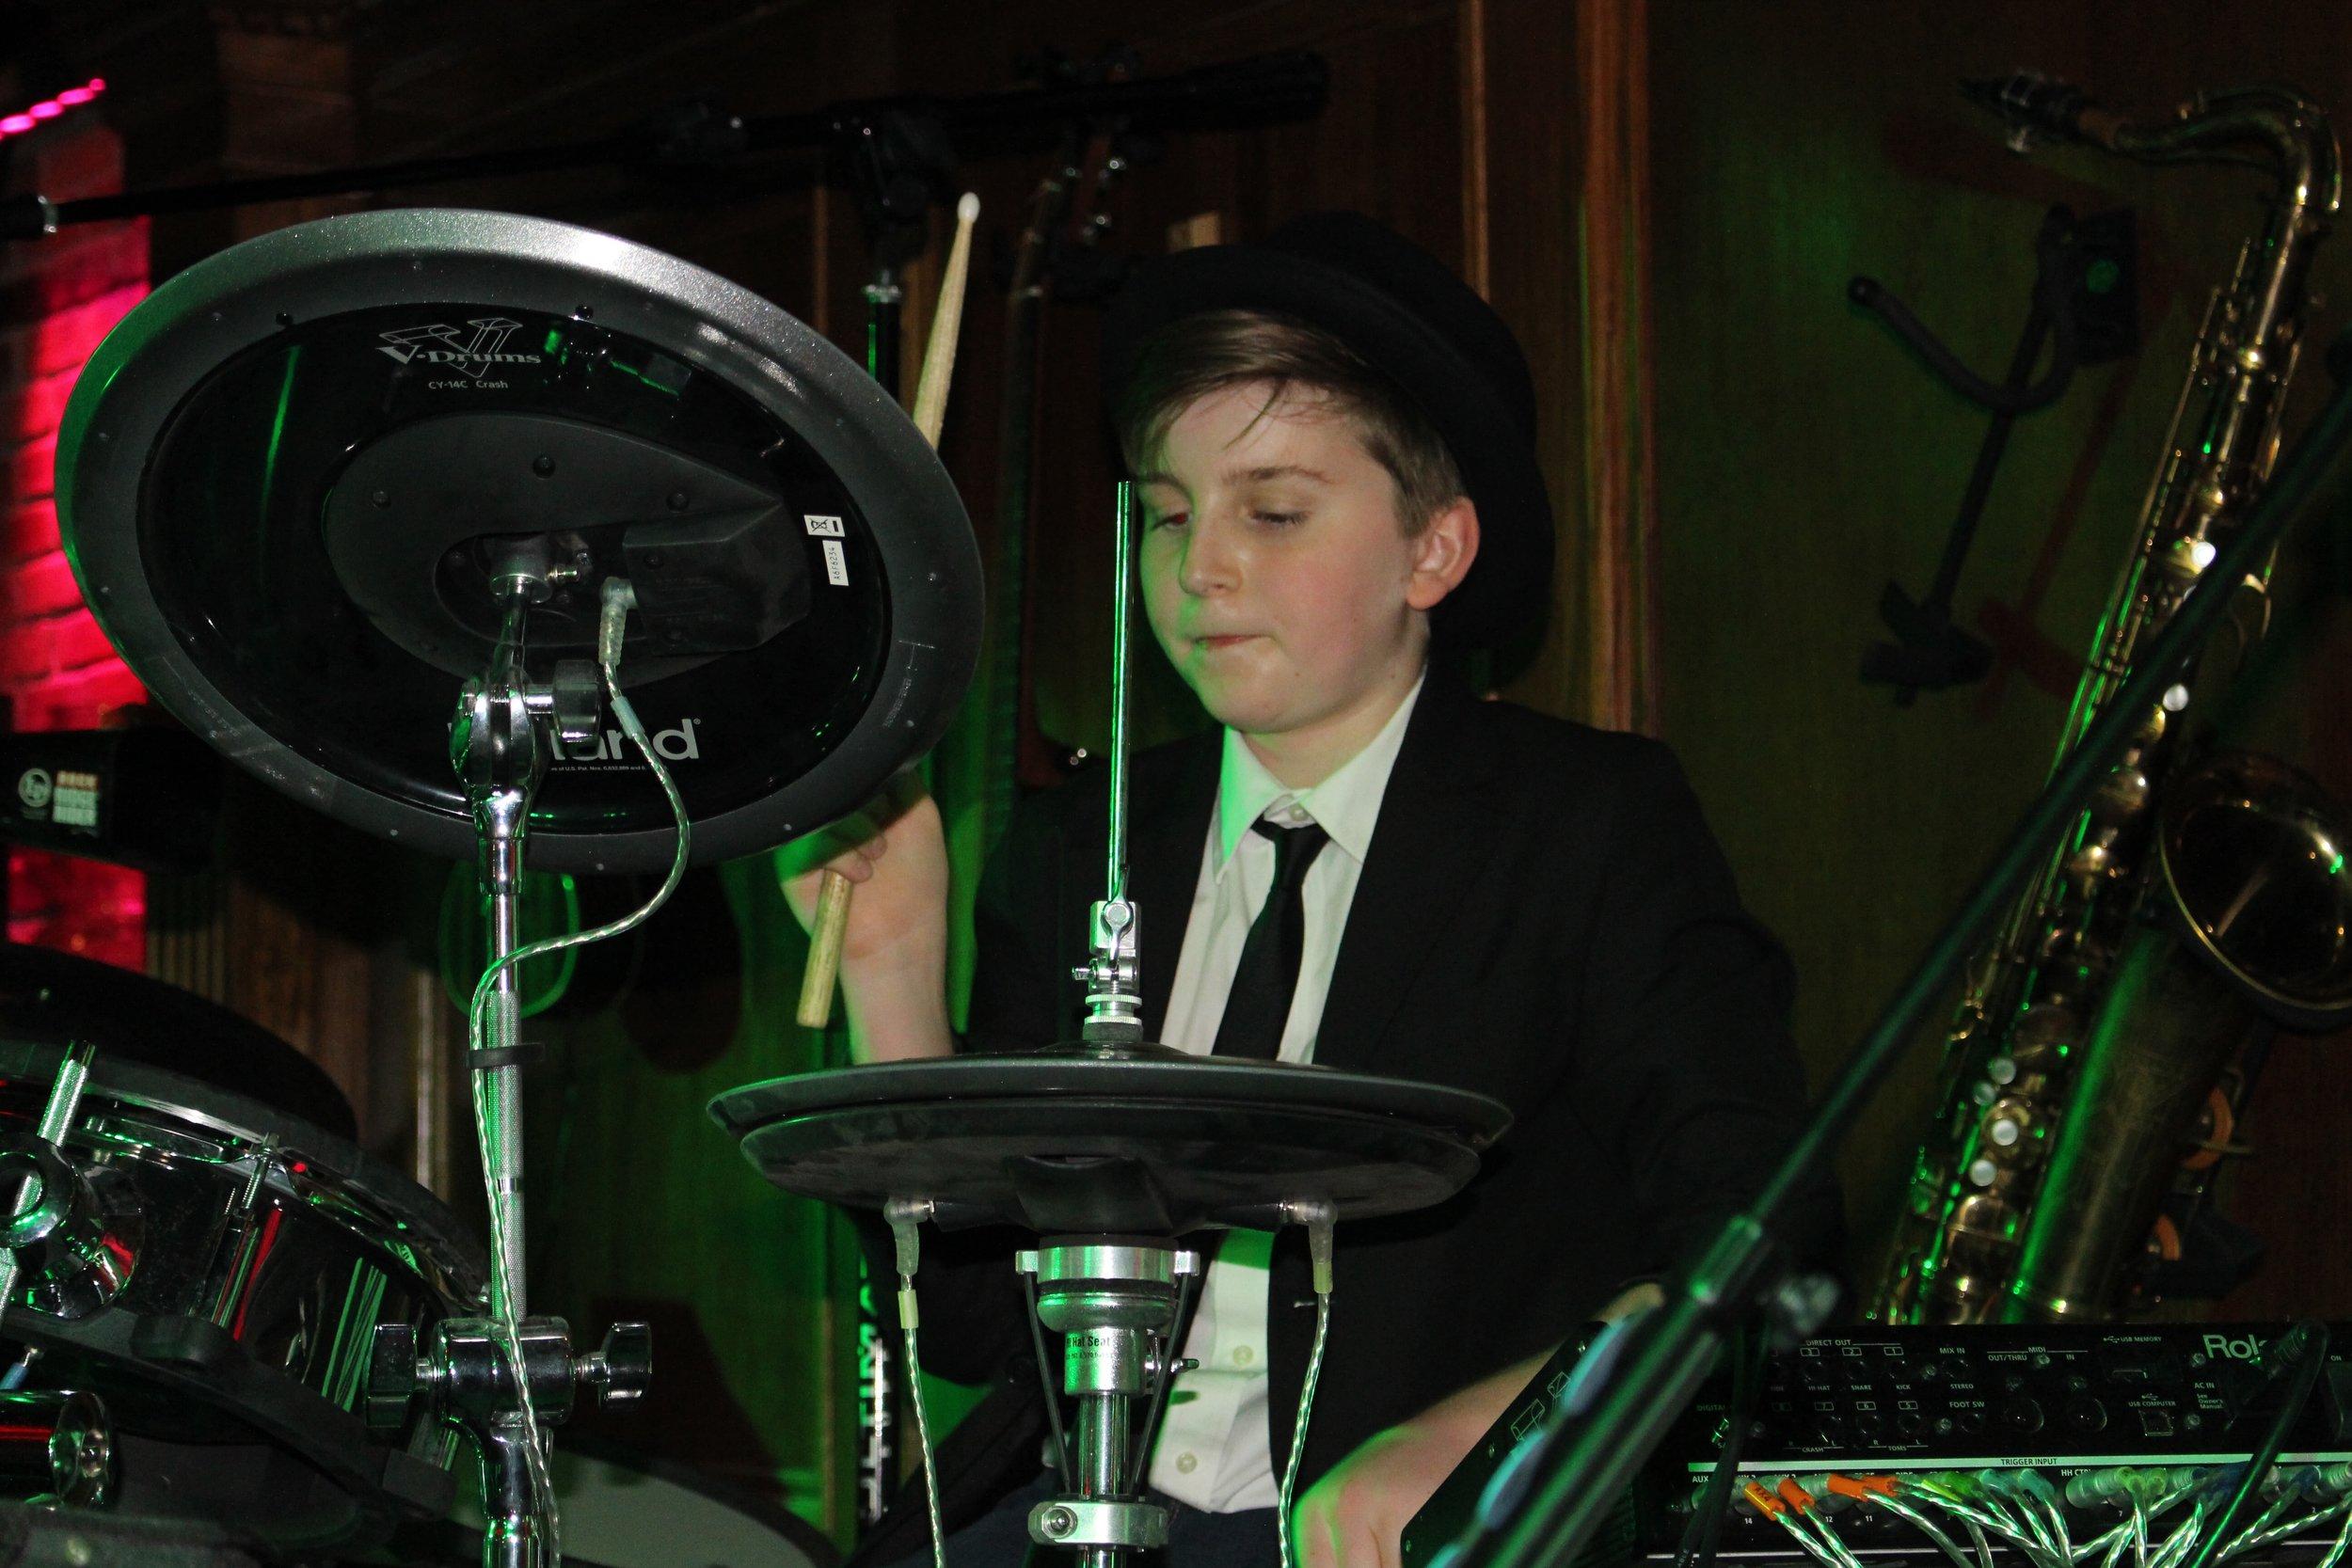 Jersey-Sullivan_Tony-Awards_party-drums_1.jpg